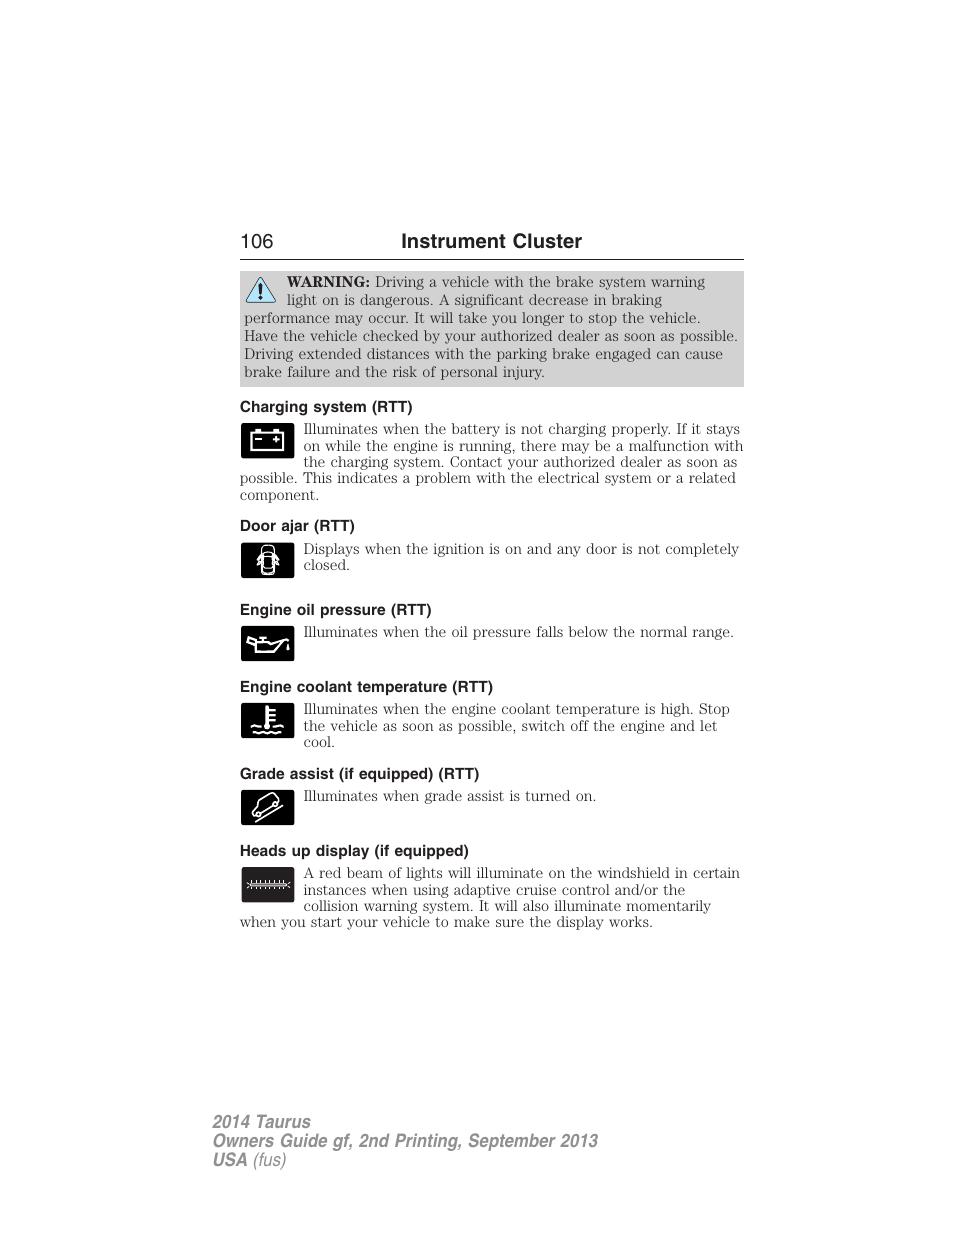 Charging System Rtt Door Ajar Engine Oil Pressure Ford 2017 Taurus V 2 User Manual Page 107 554